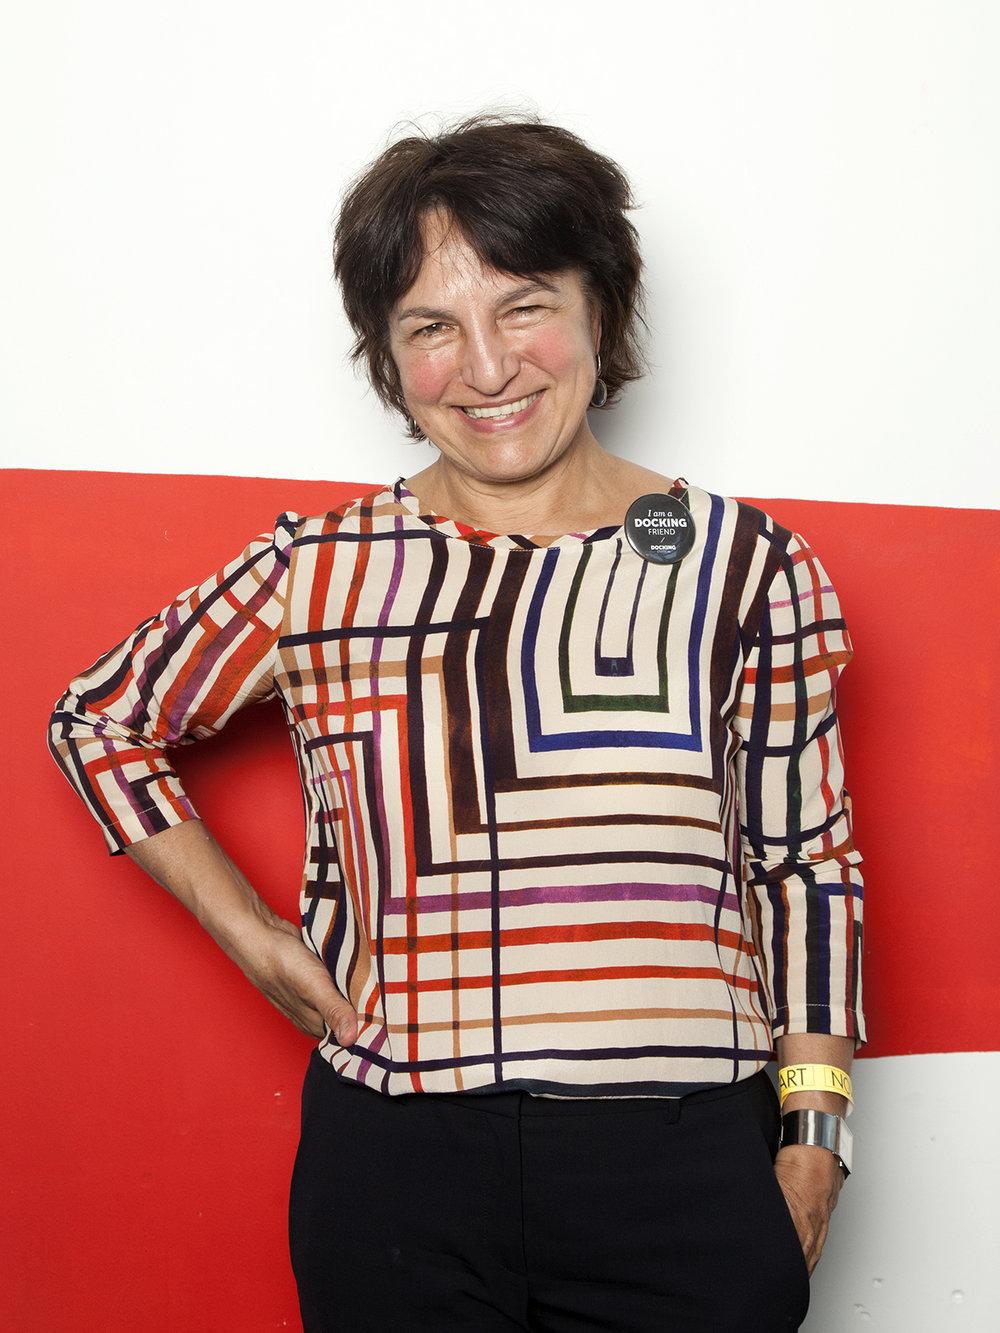 Madeleine van Lennep